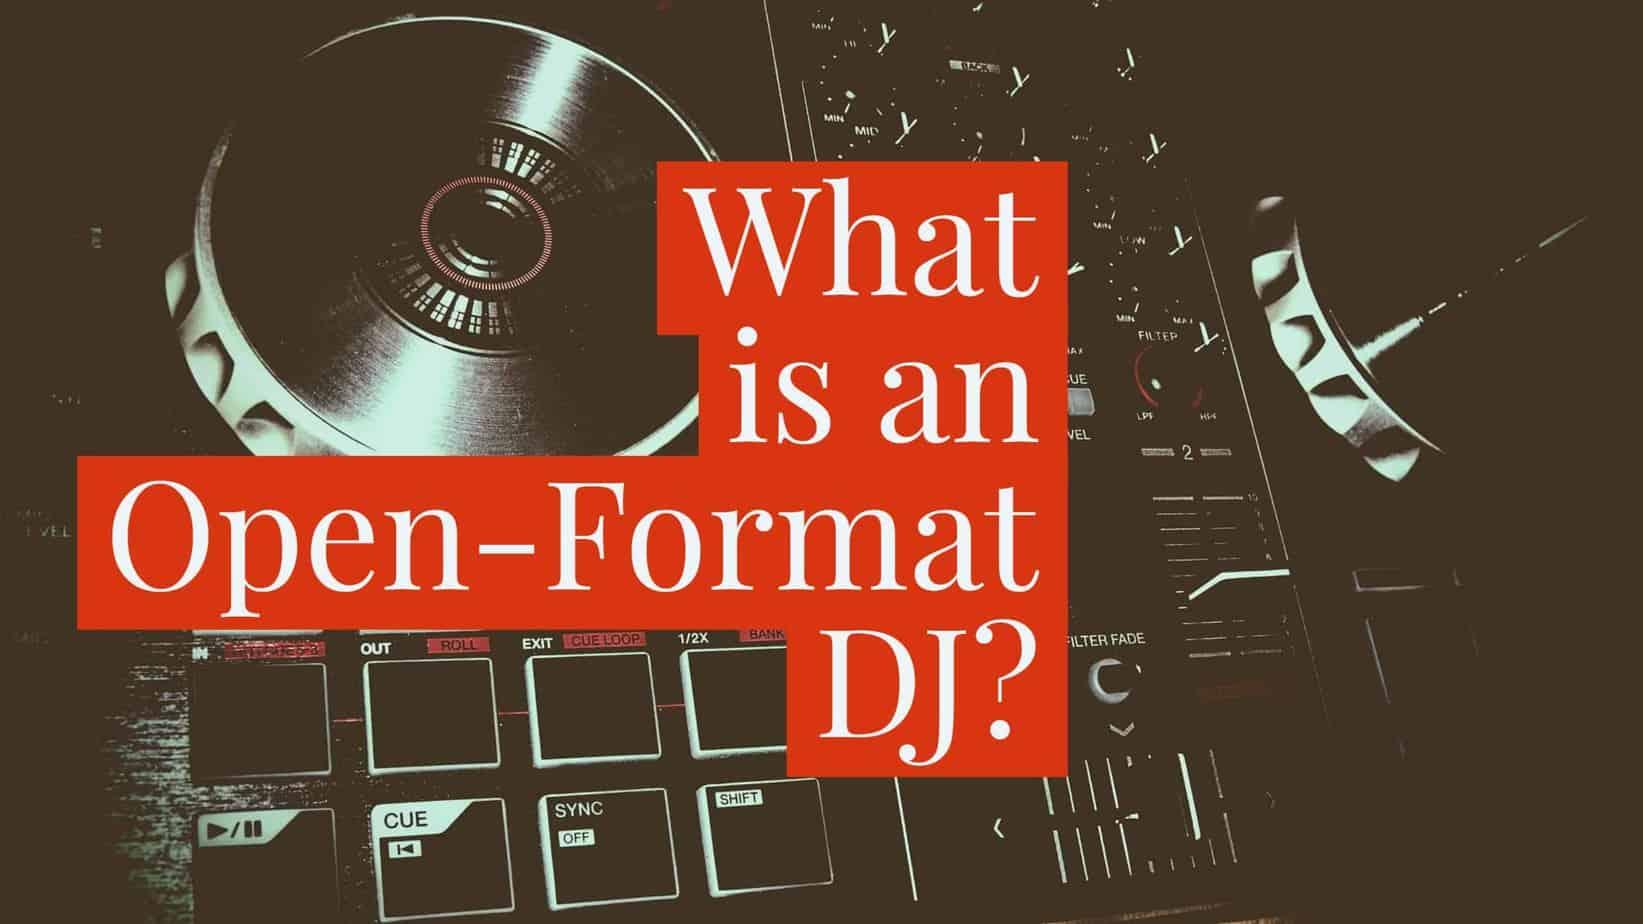 What is an Open-Format DJ?